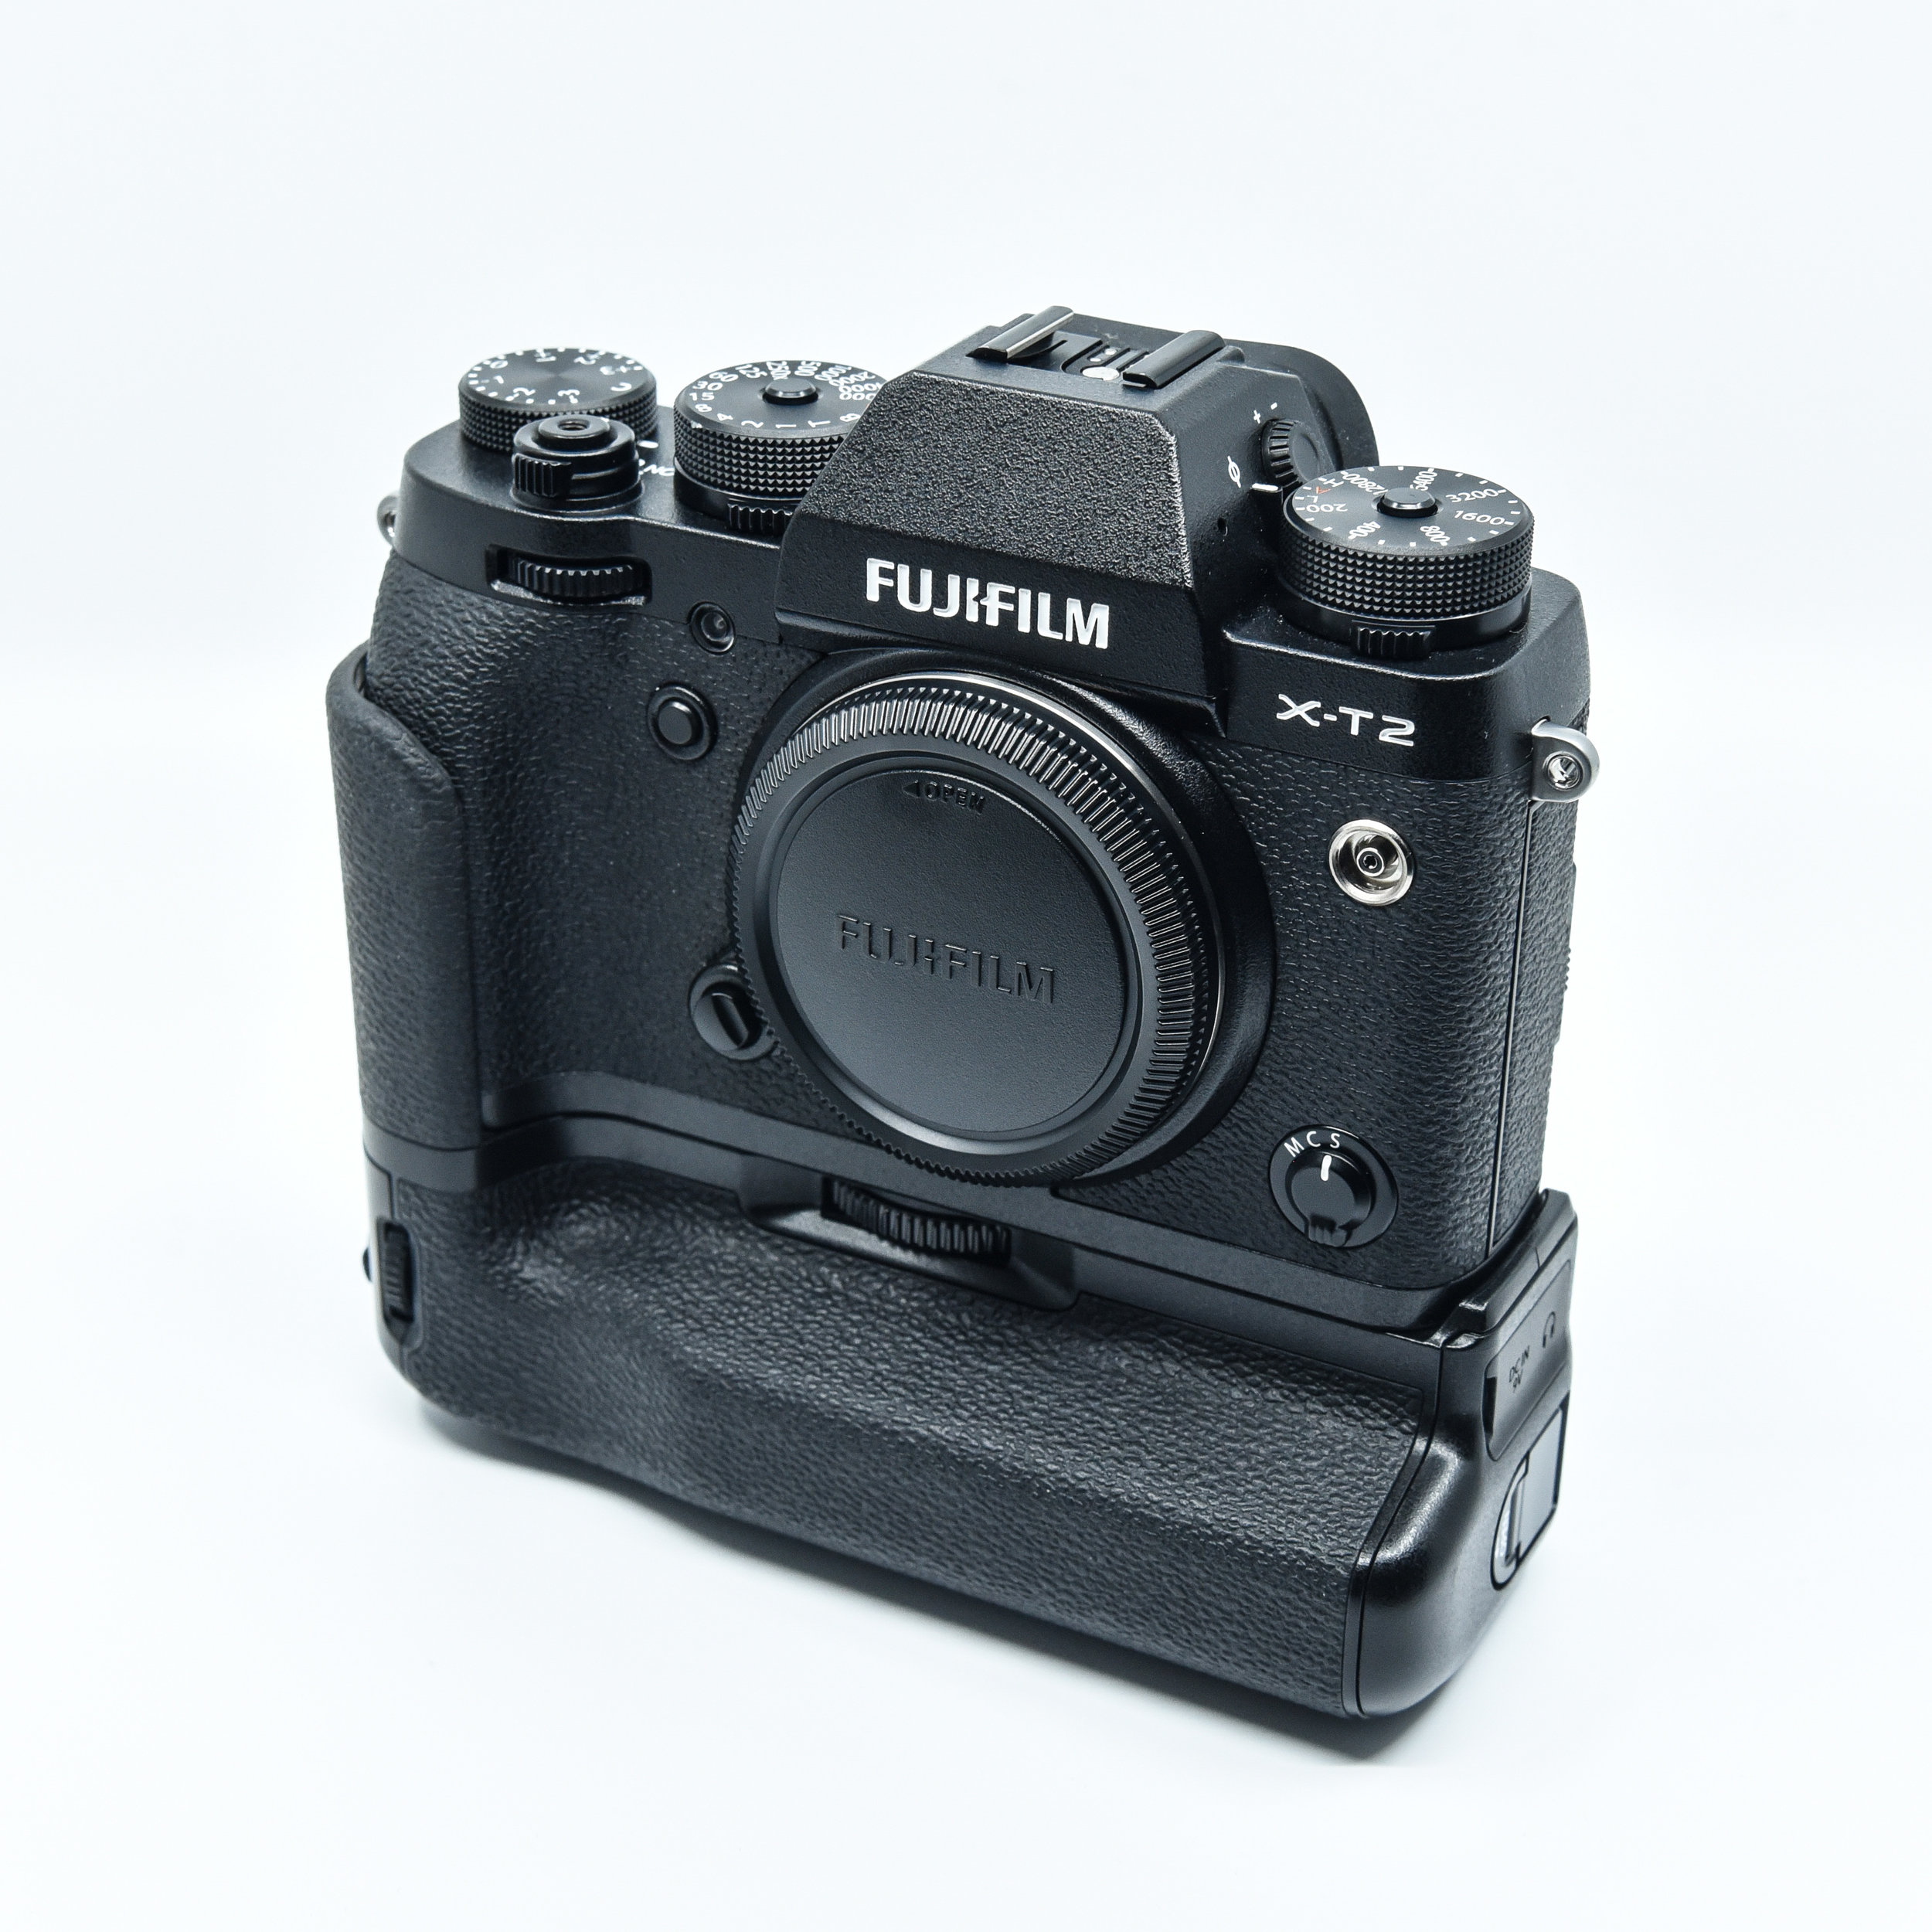 181028_Fujifilm X-T2 71M60416_004.jpg